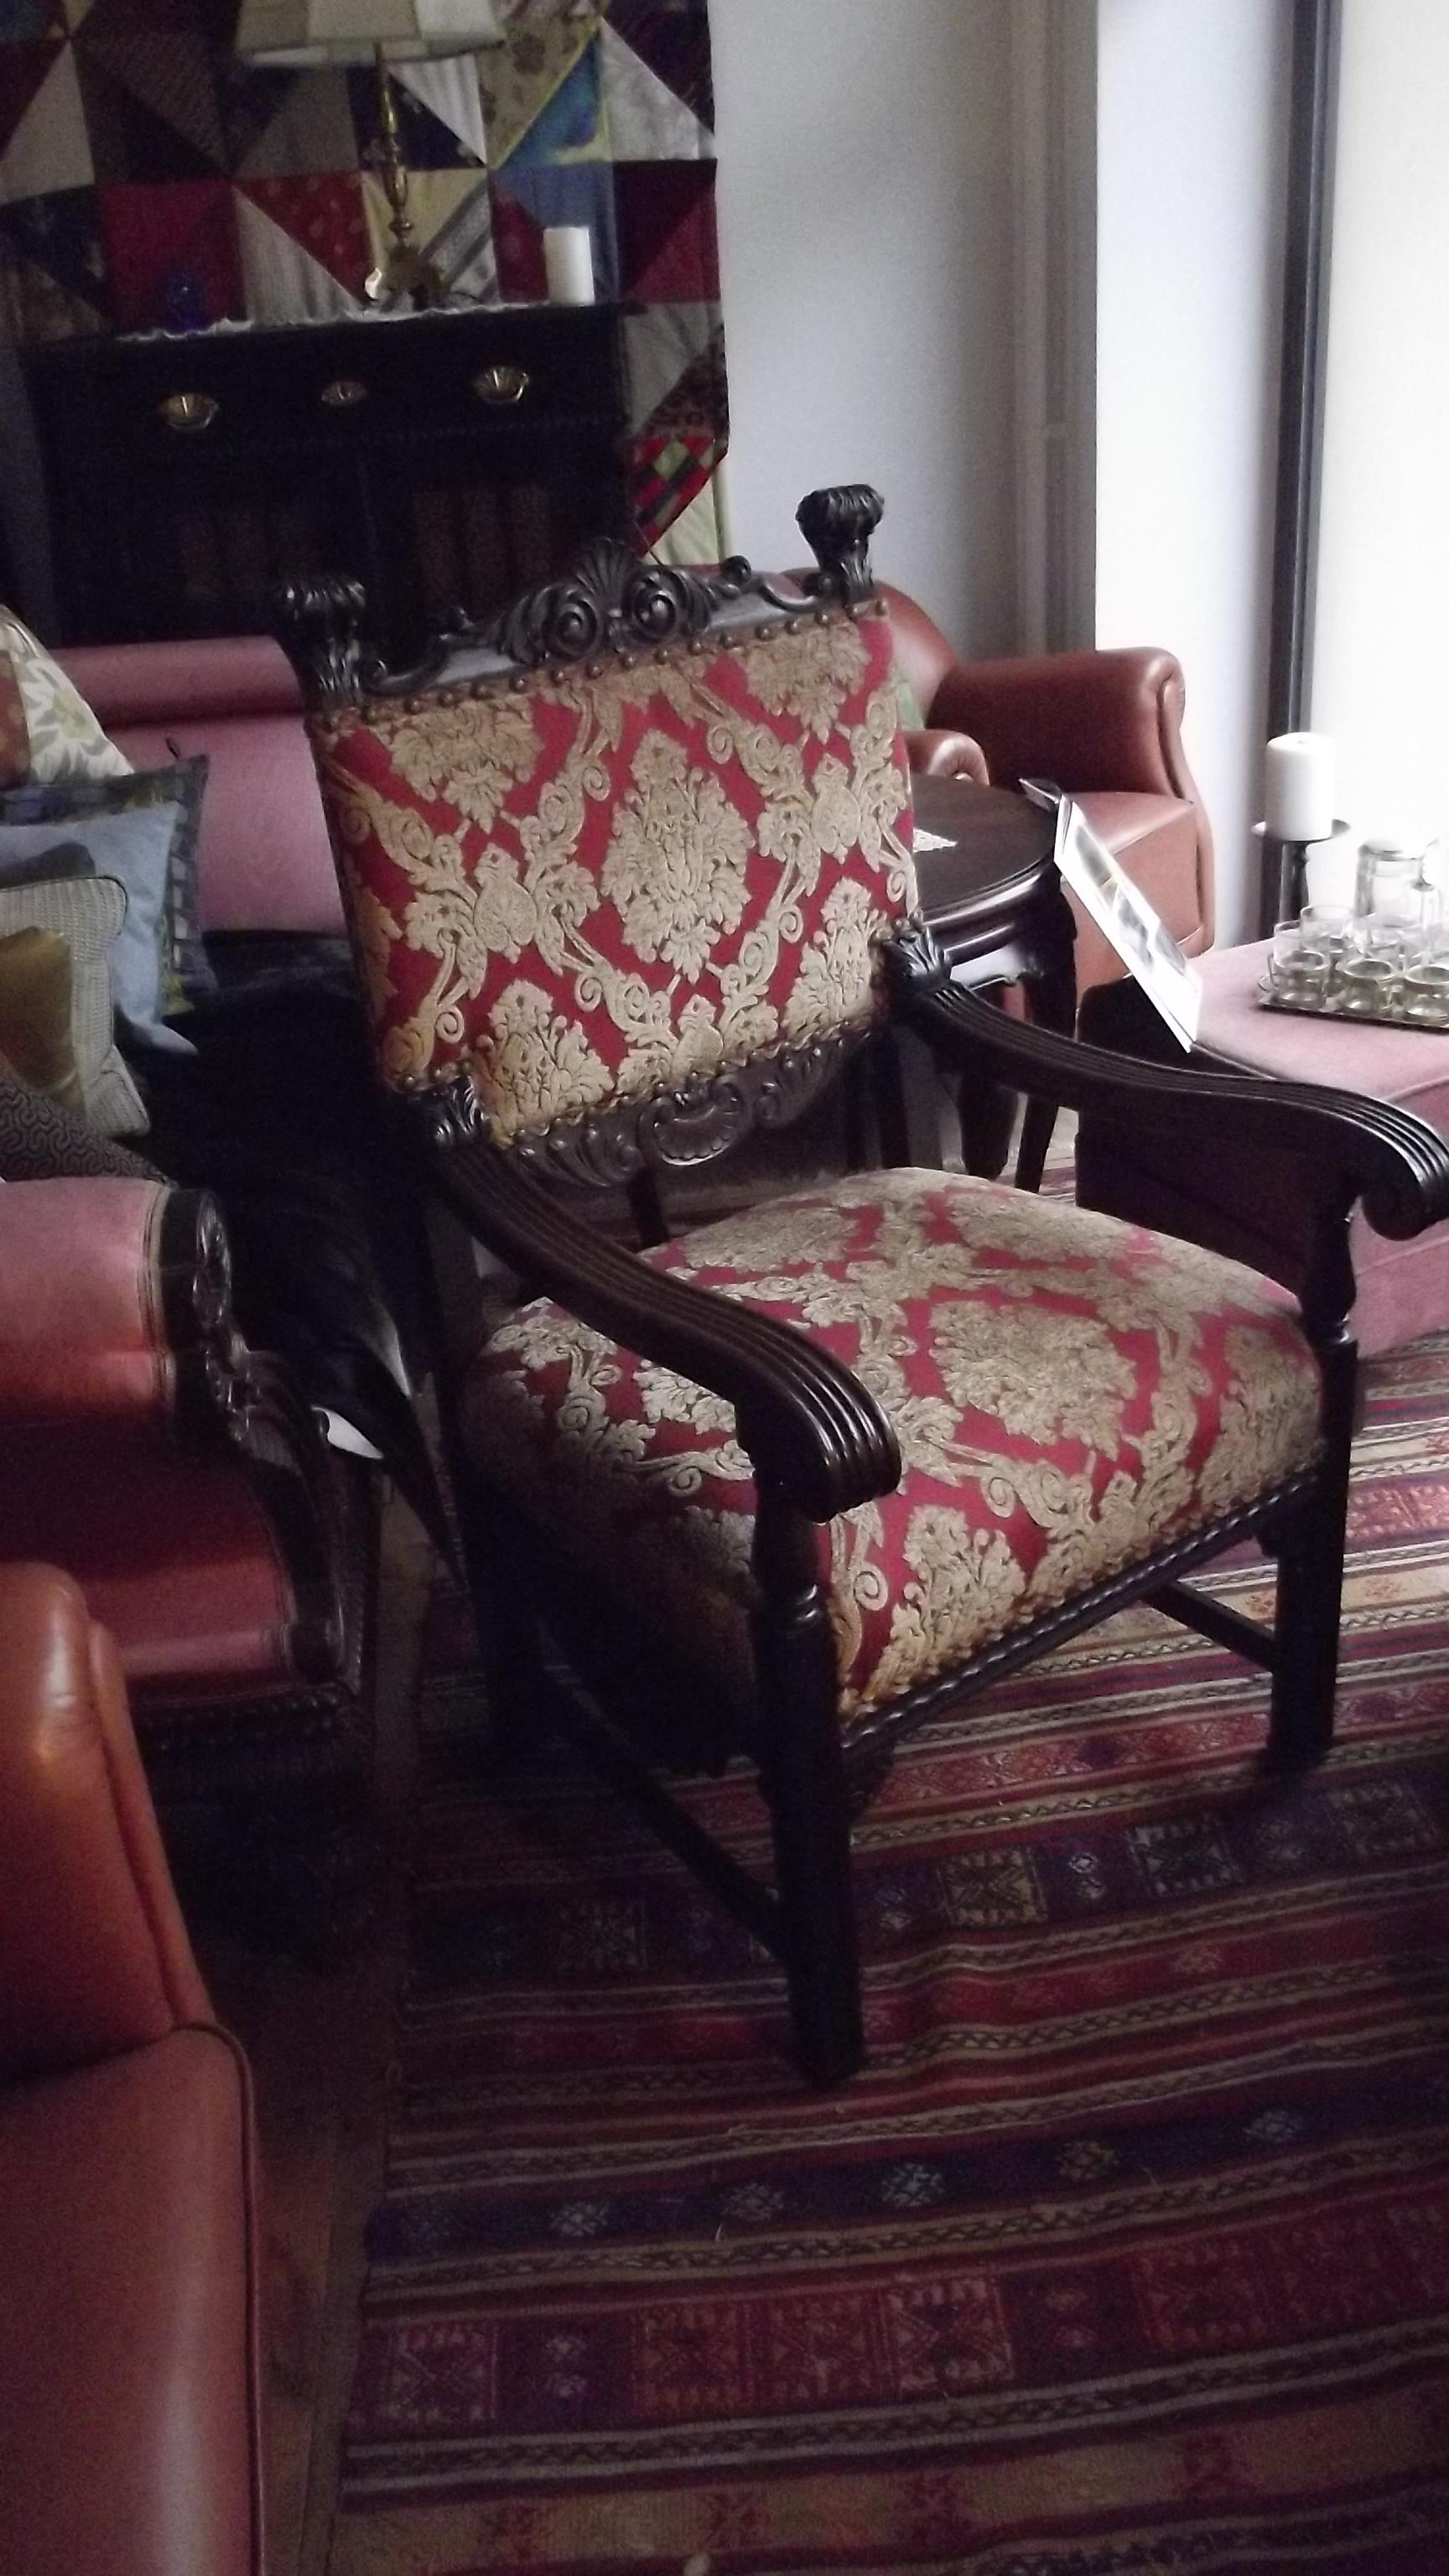 Klappliege-Sofa mit handgearbeitetem Patchwork Lederbezug